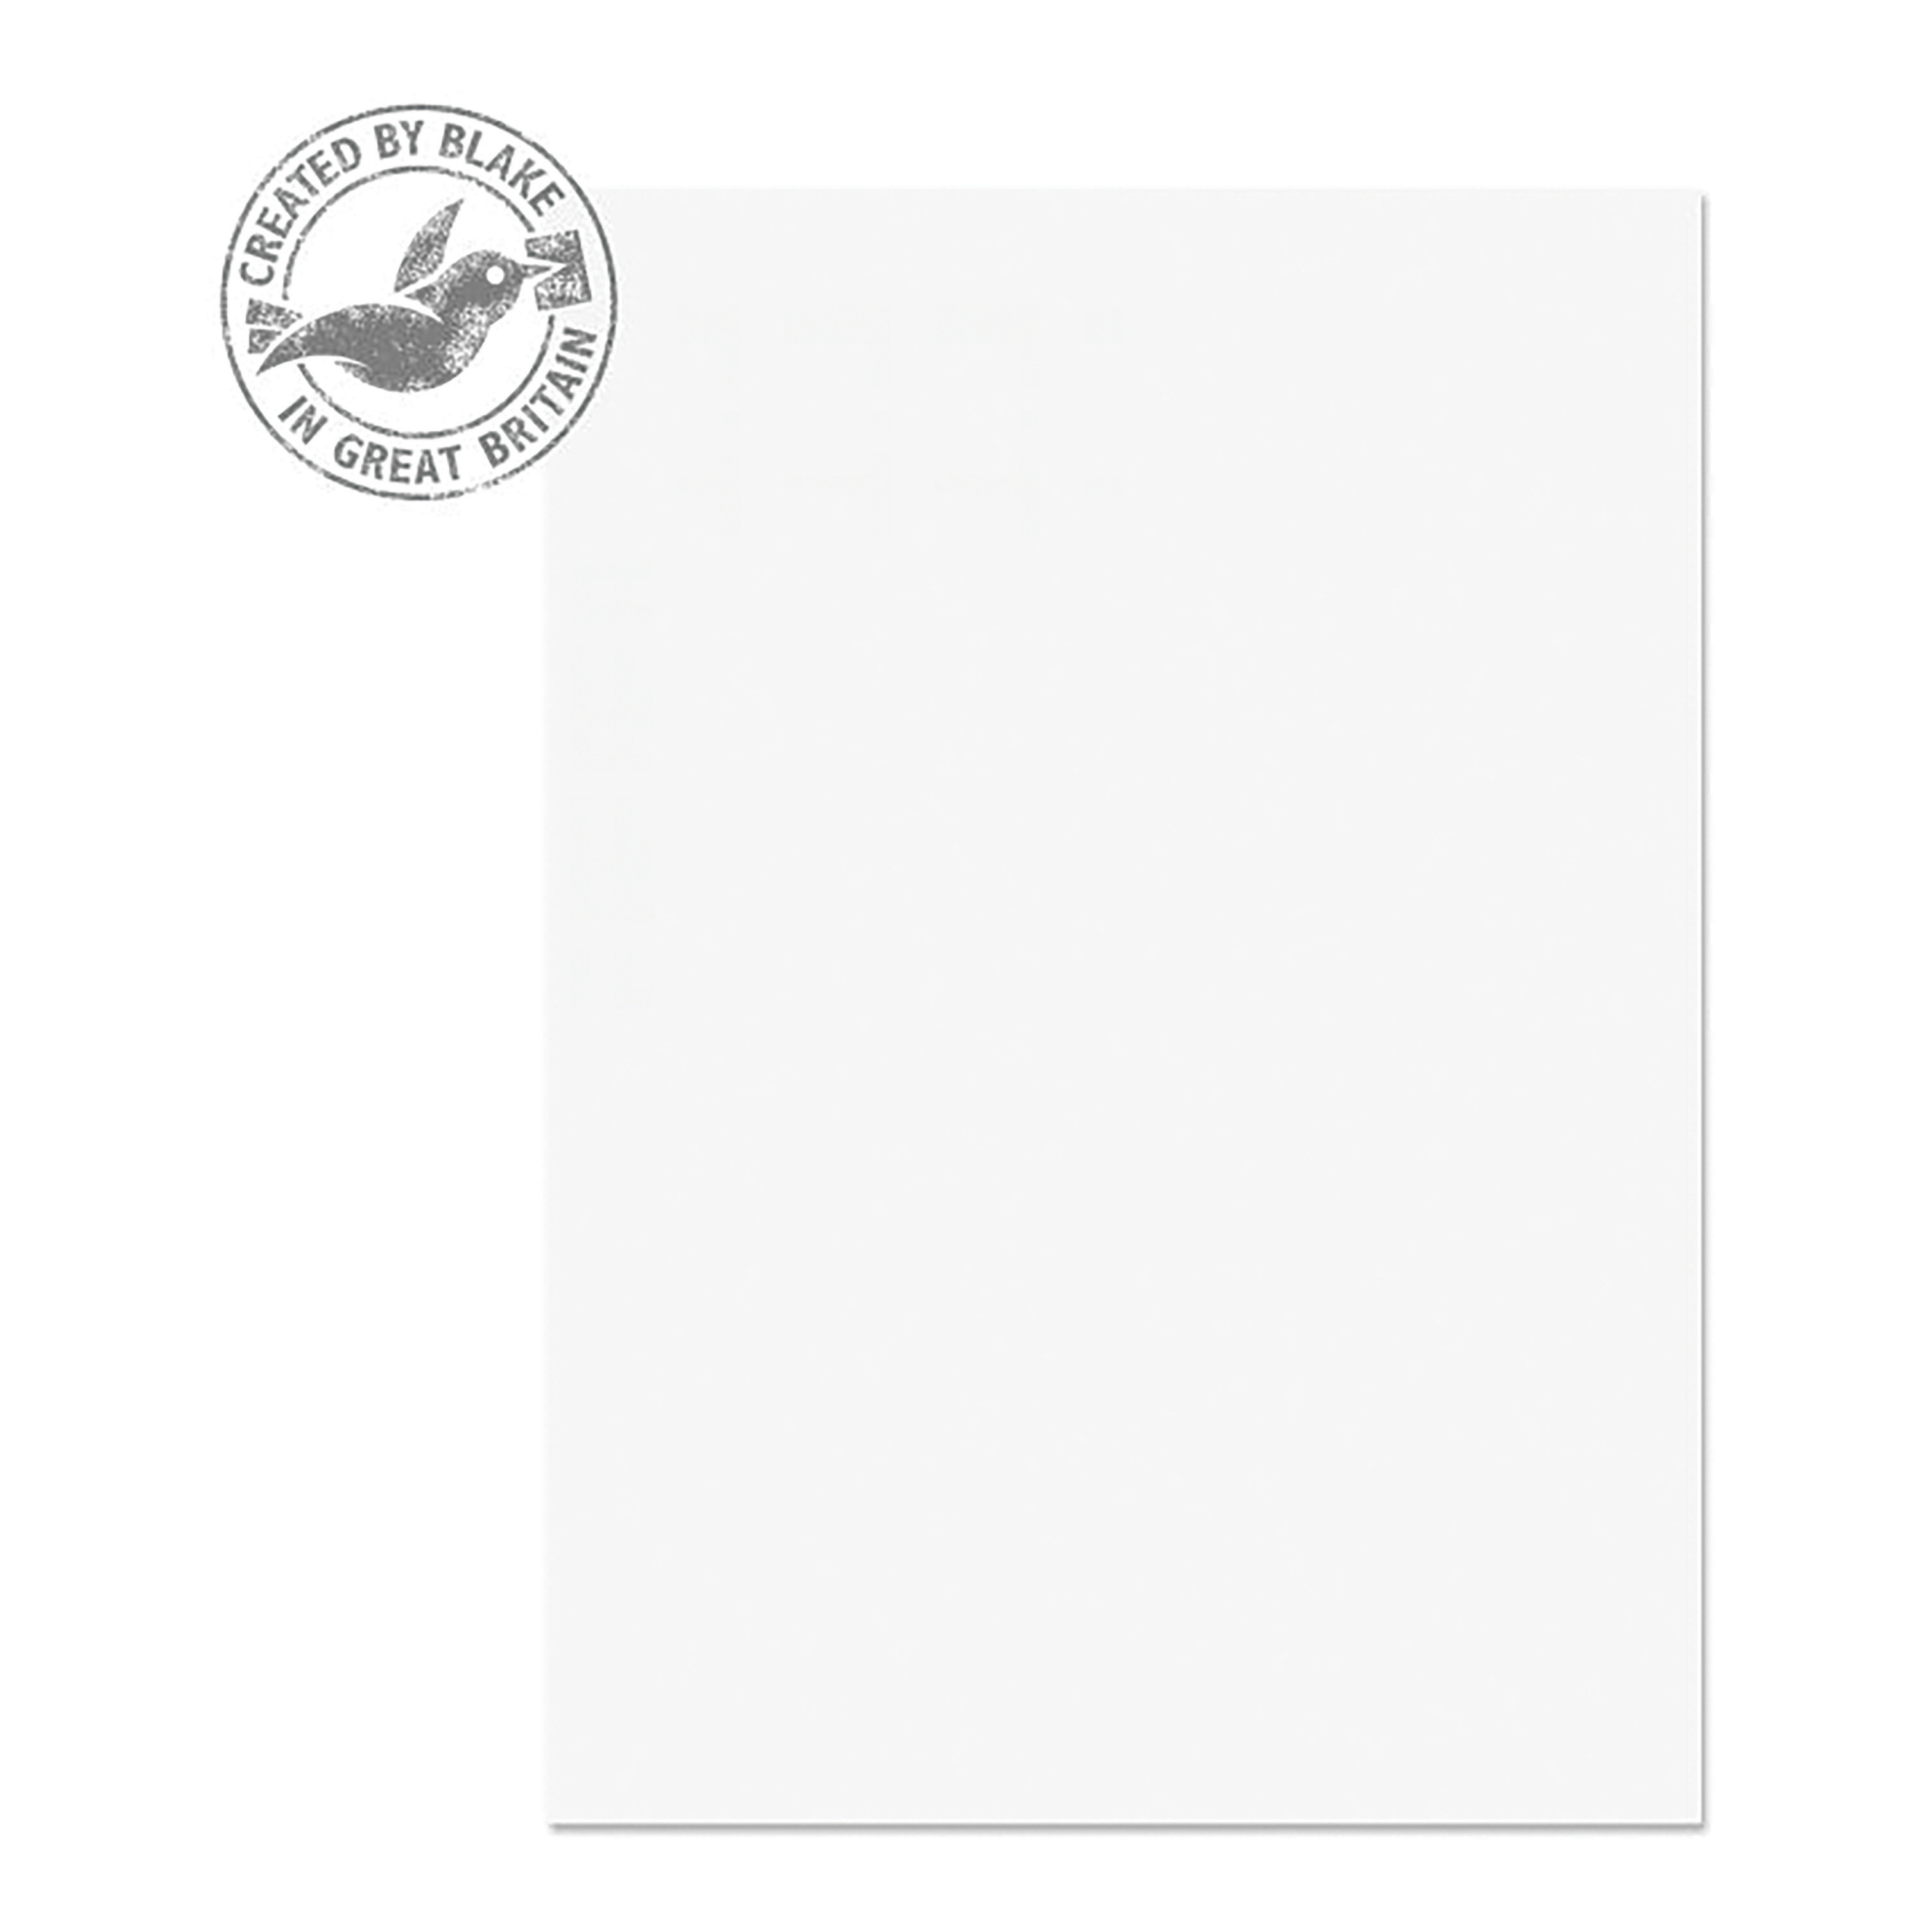 Blake Premium Business Paper Diamond White Smooth Finish 120gsm A4 Pack 50 Ref 36676